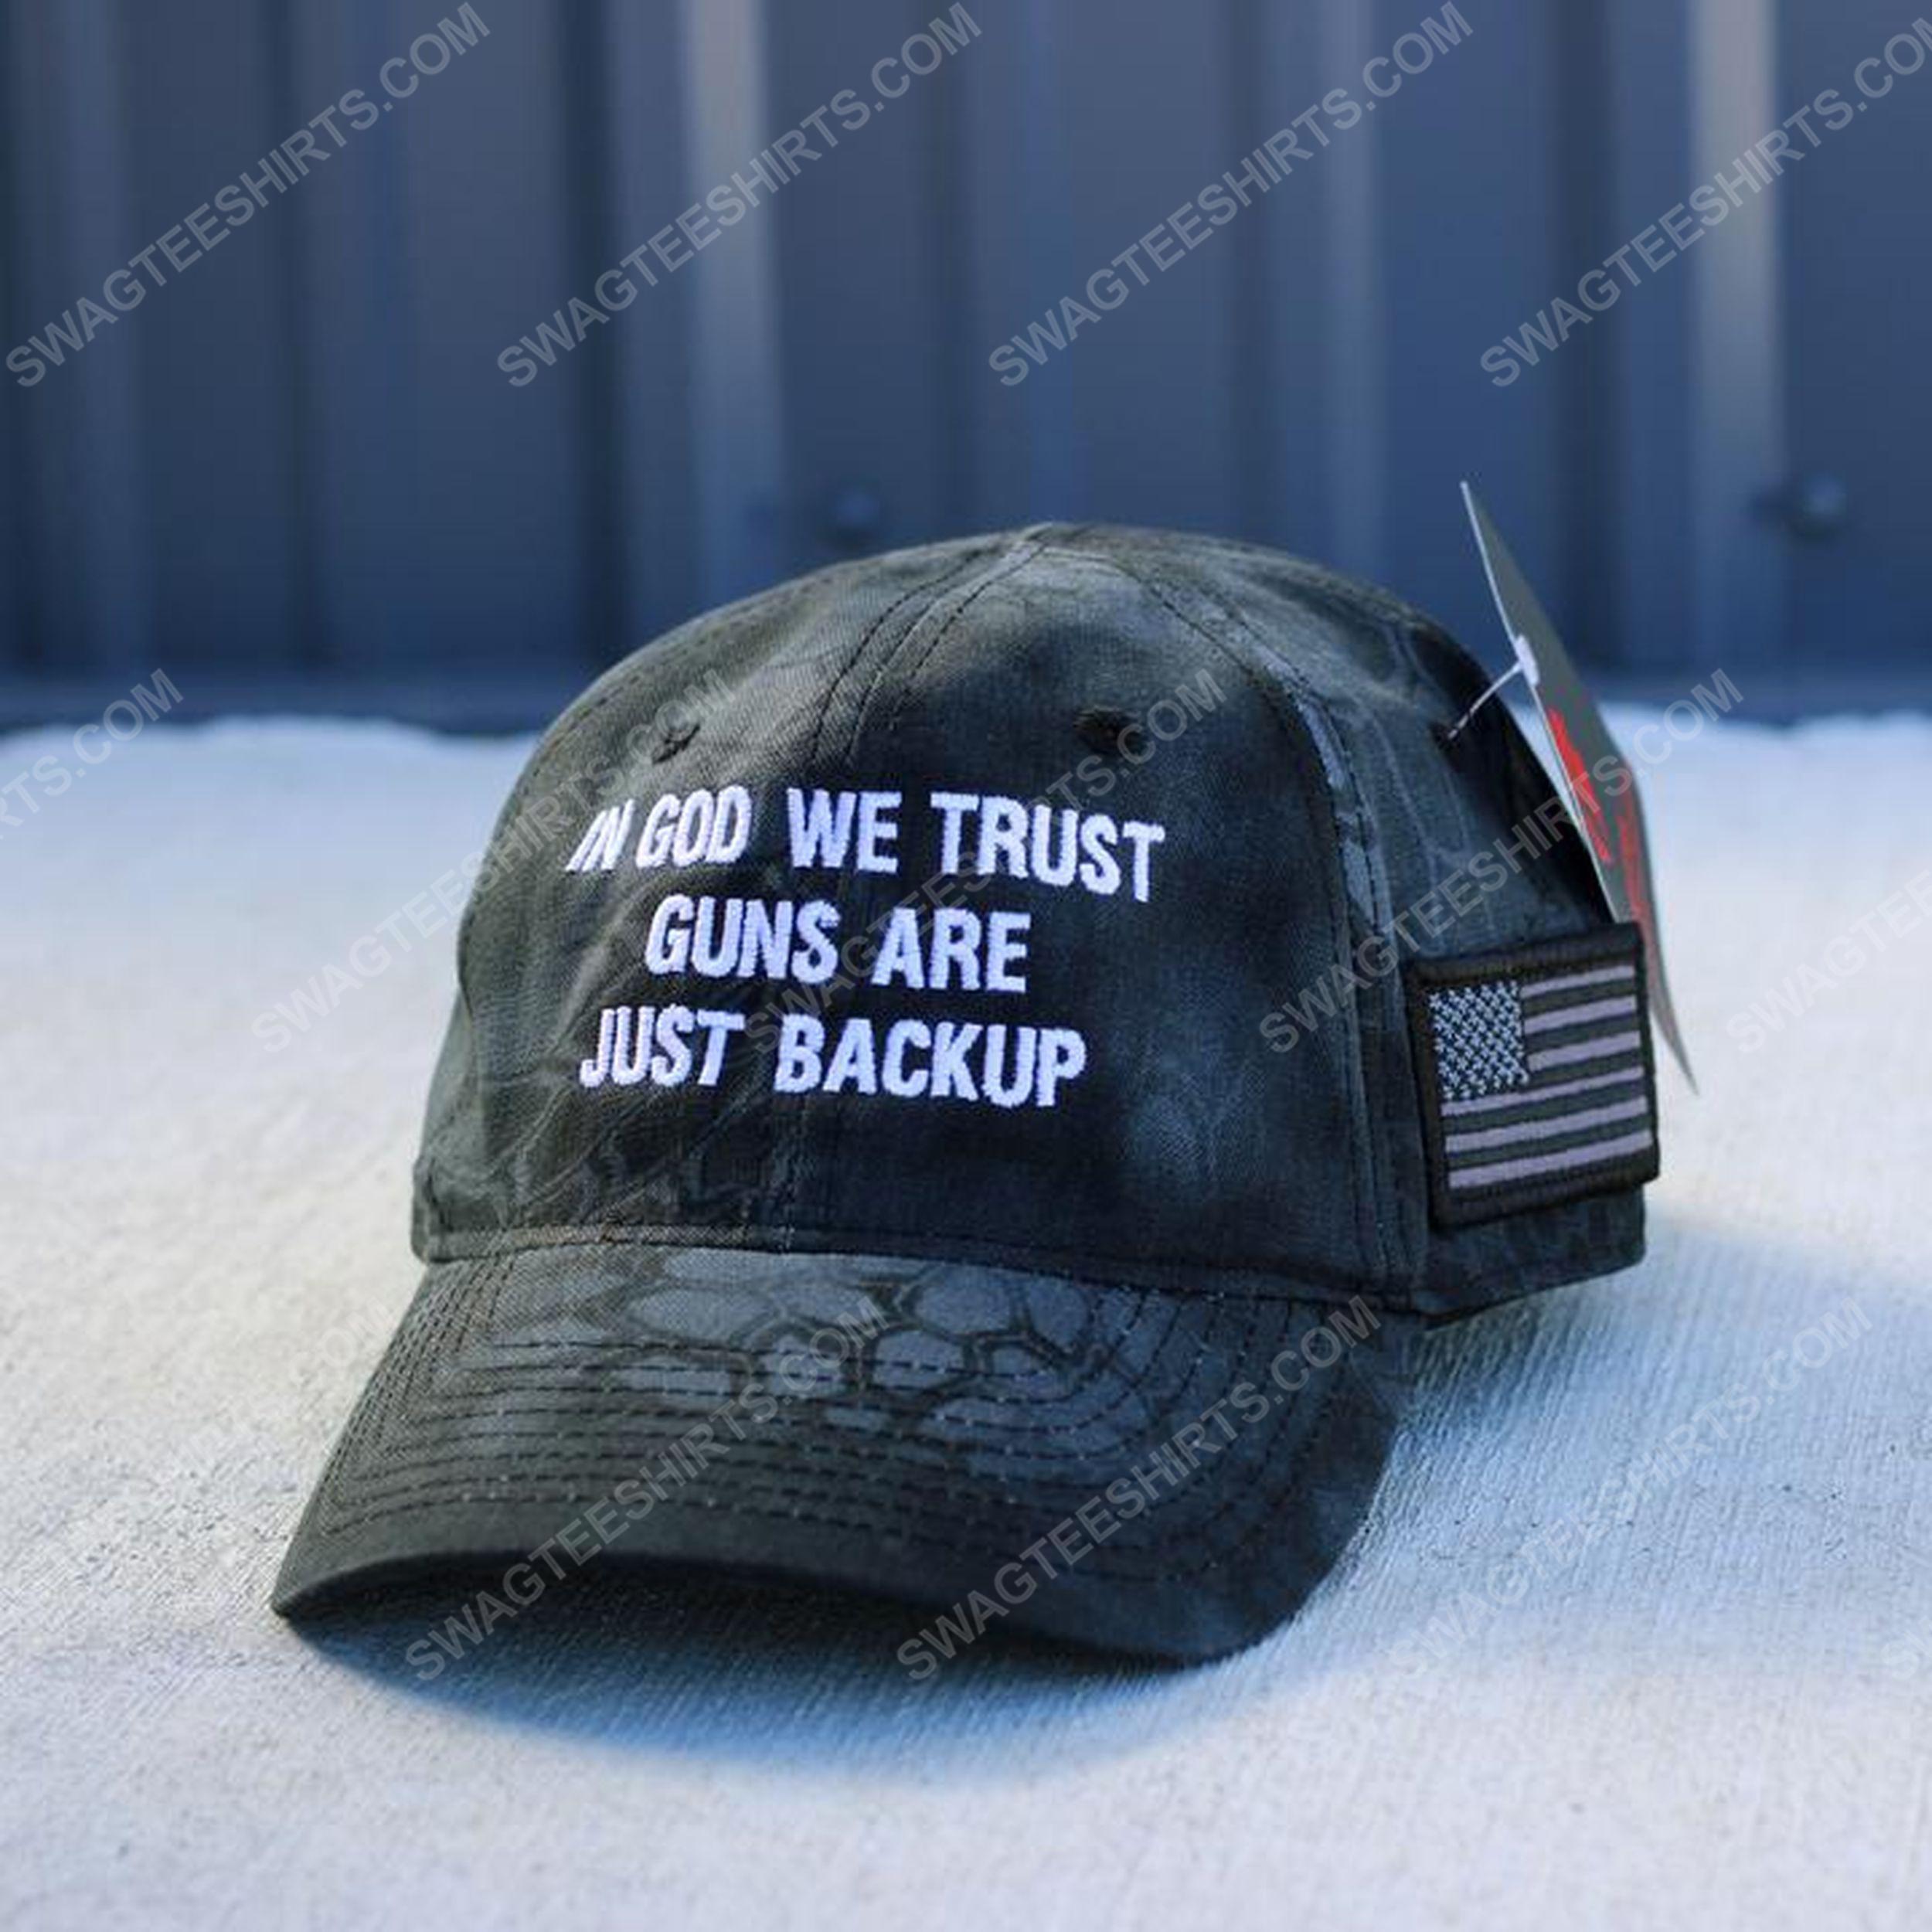 In God we trust guns are just backup full print classic hat 1 - Copy (3)